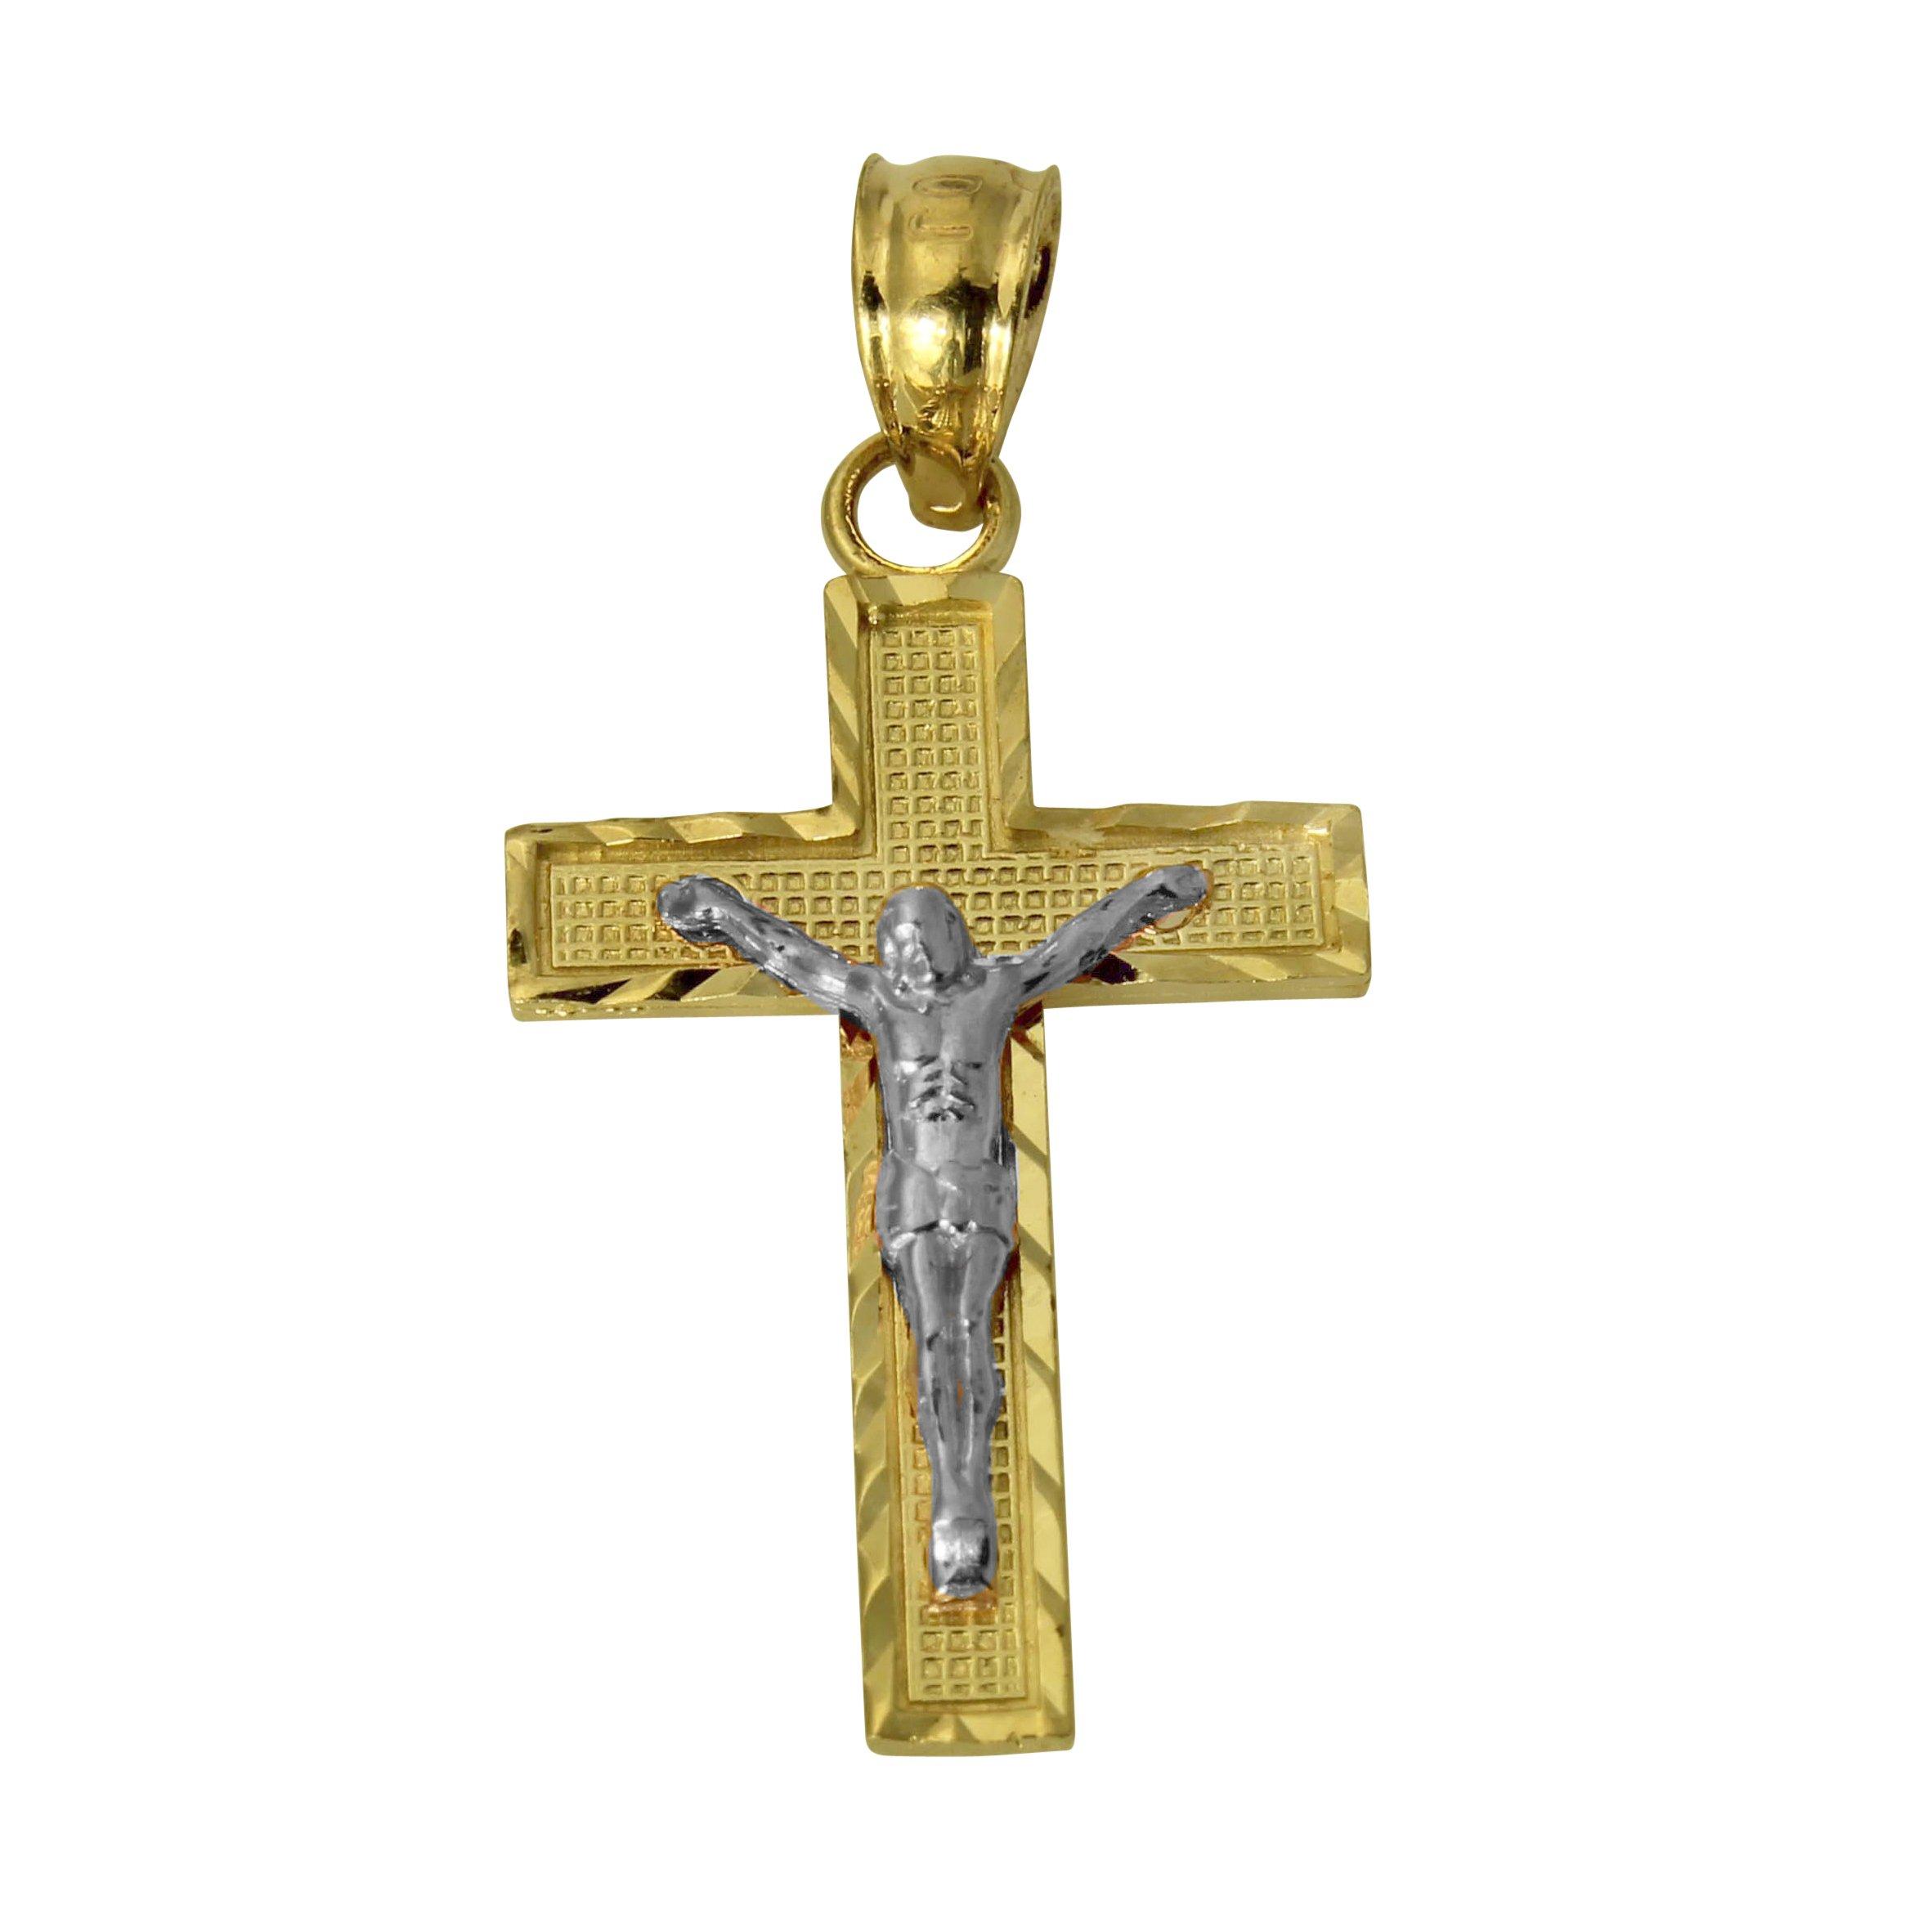 14K Yellow Gold Small Jesus Cross Crucifix Diamond Cut Pendant Baby /& Children